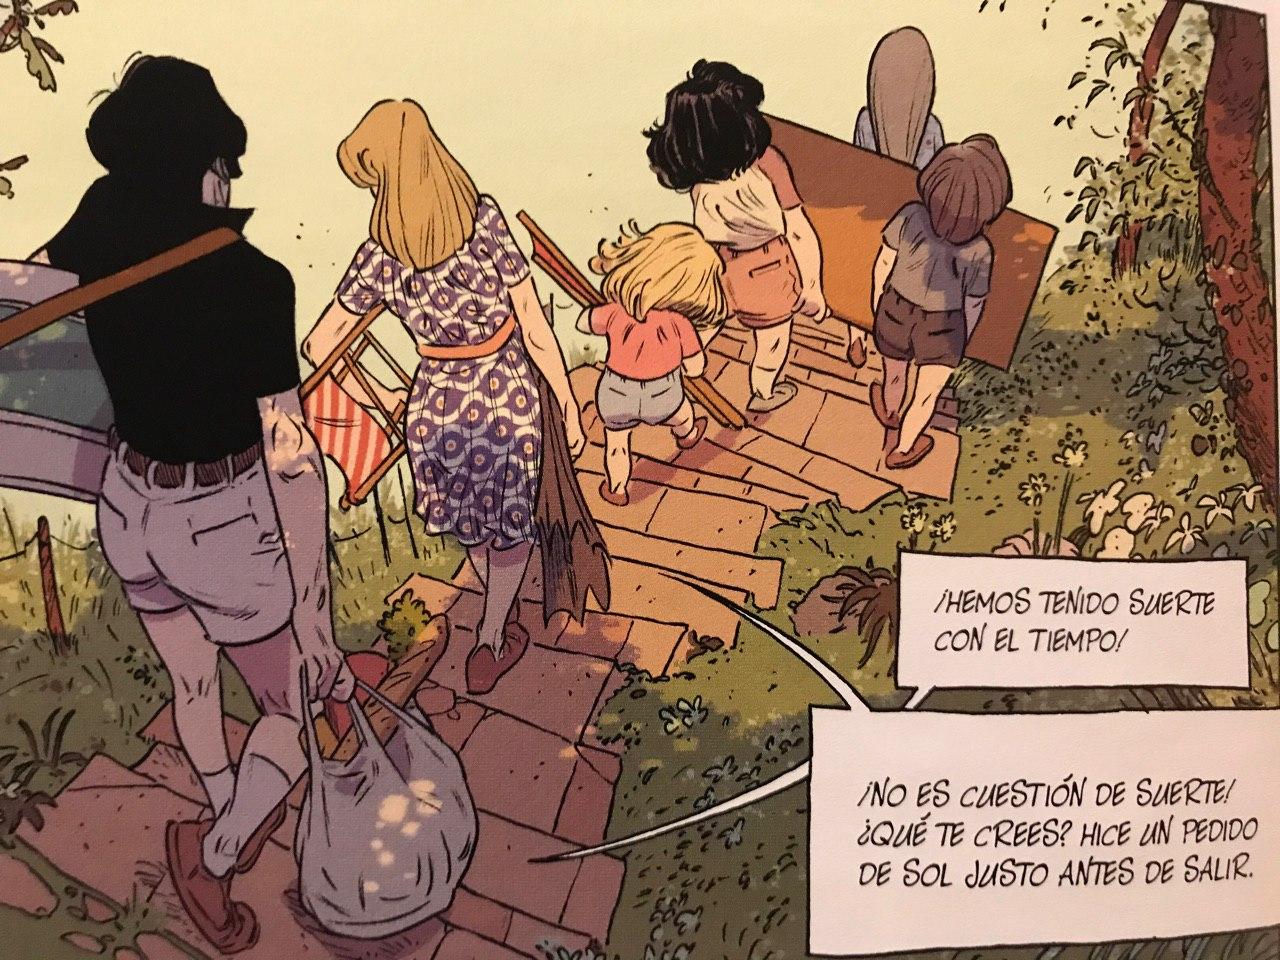 Golem-Comics-resena-los-buenos-veranos-03